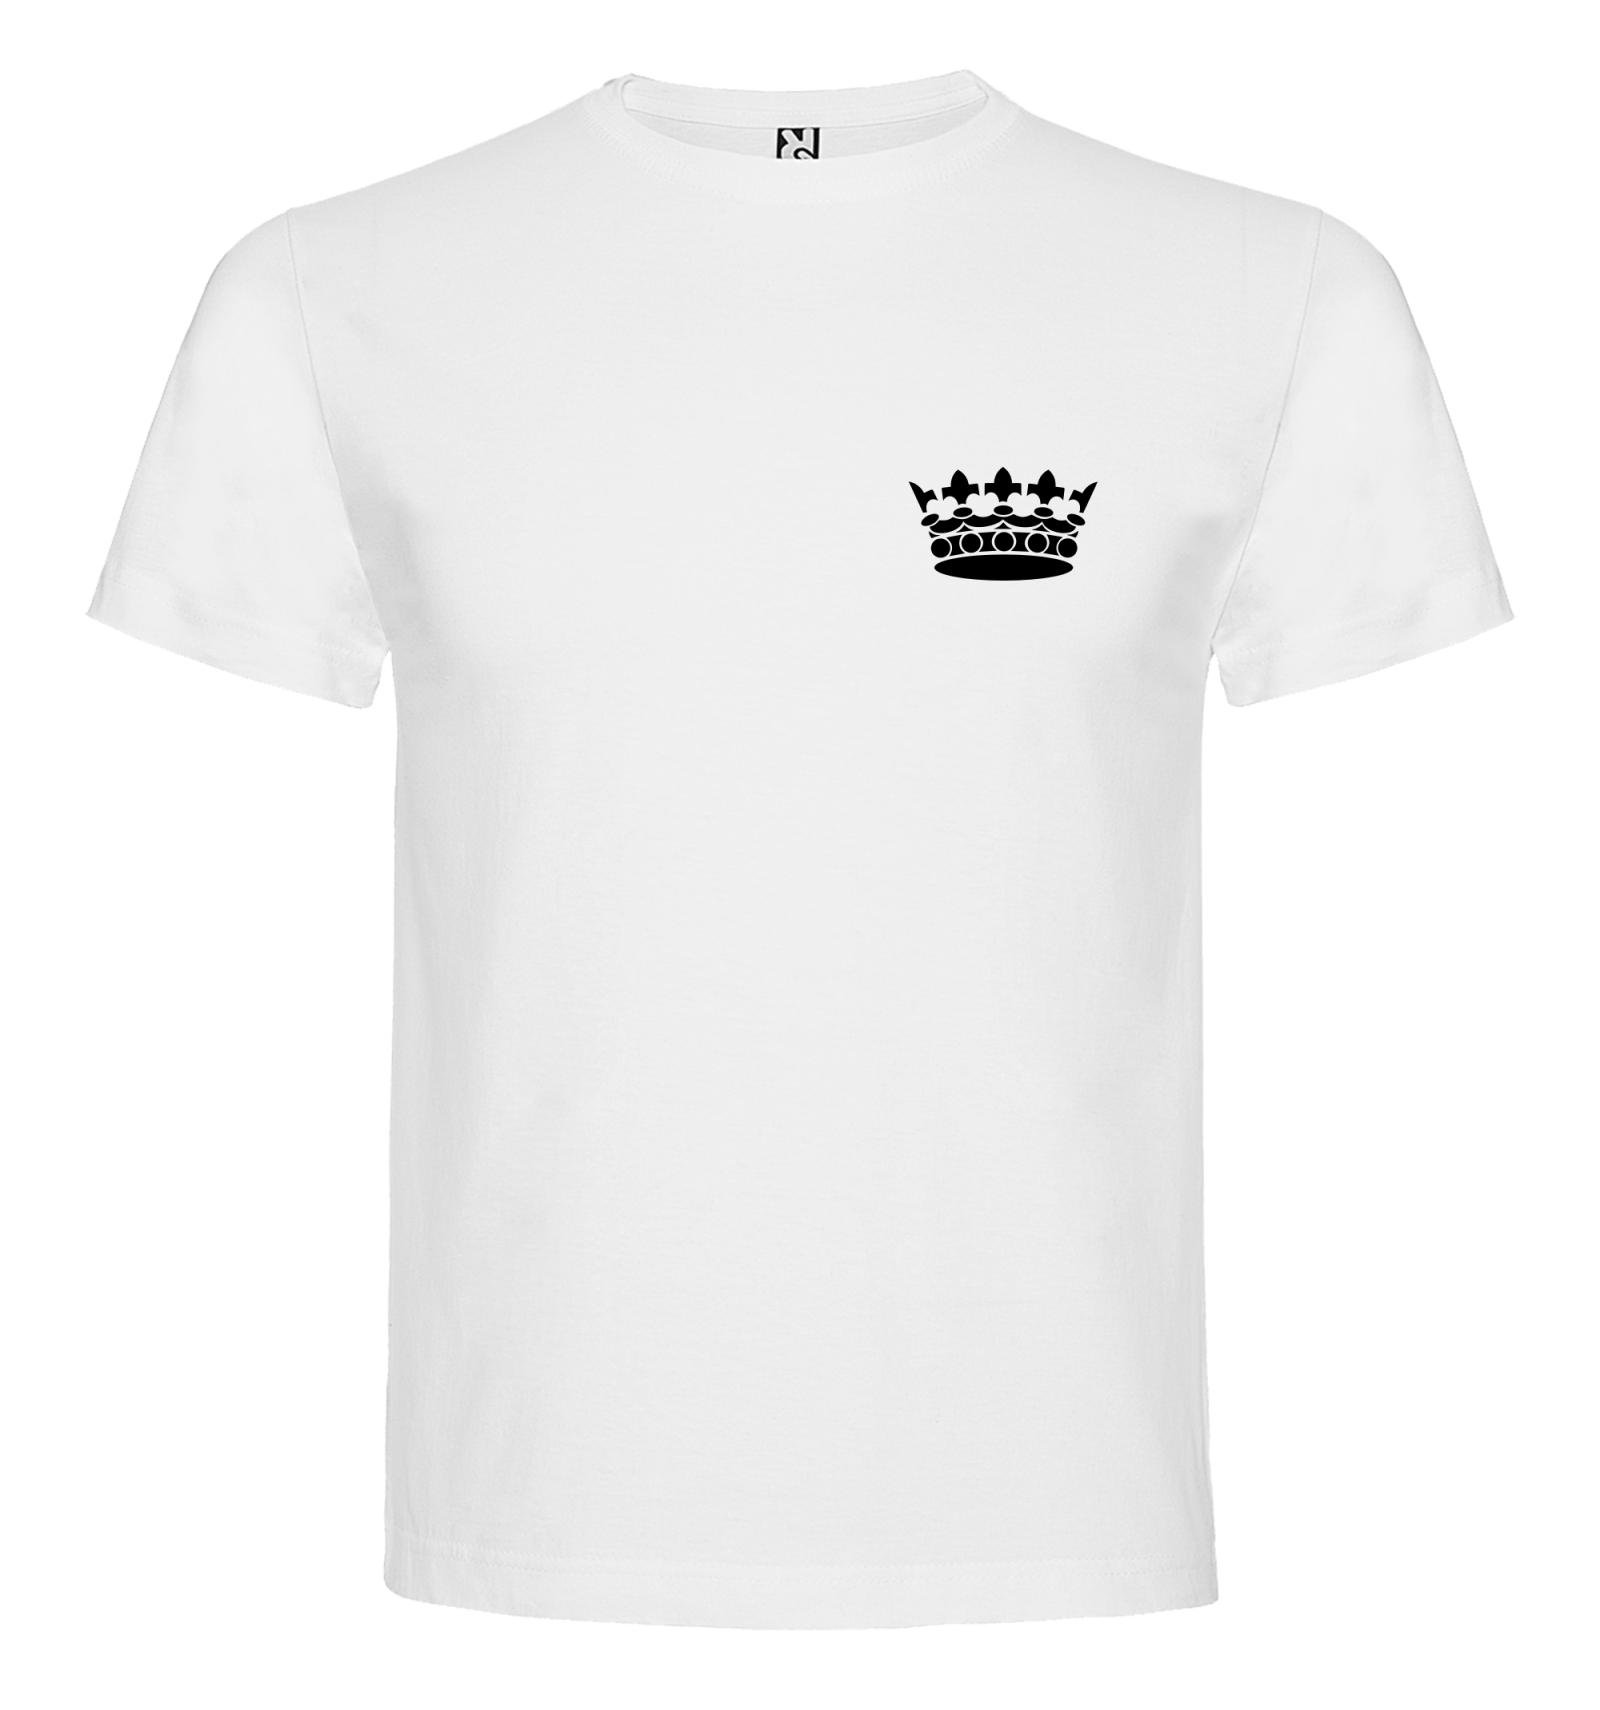 ac97a88e927c Pánské tričko KING s korunkou - BVTRIKO